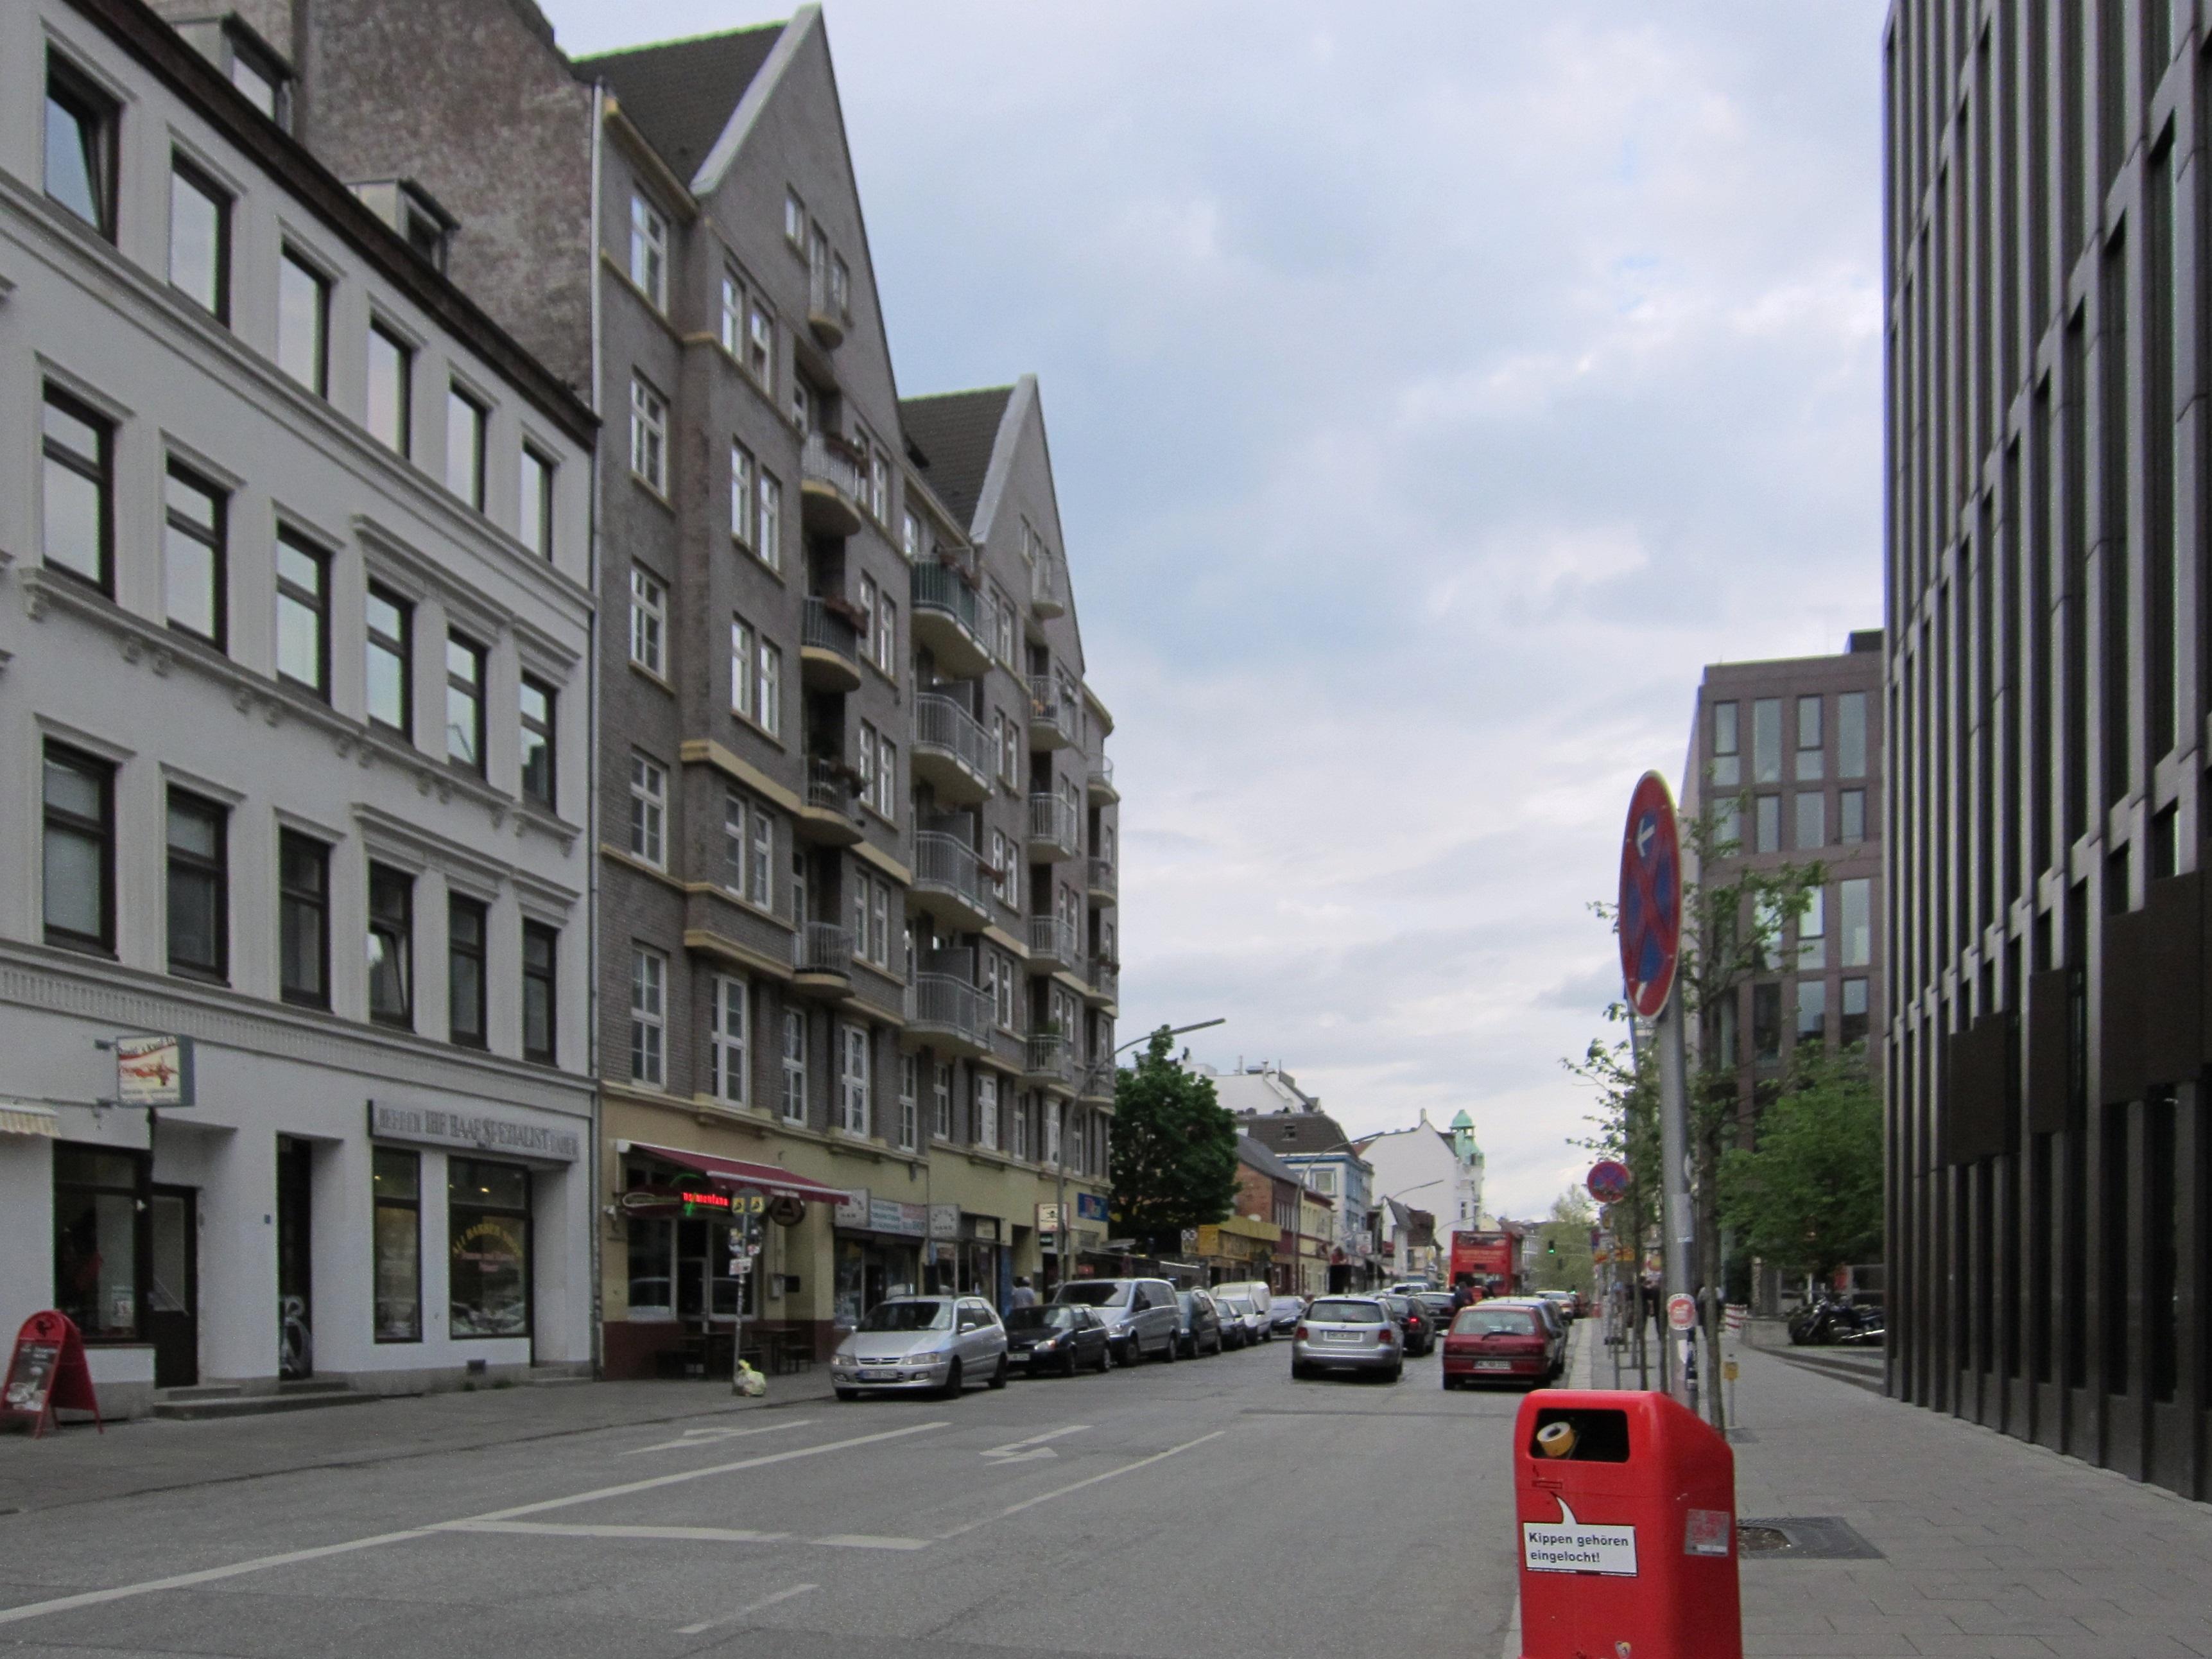 File:Davidstraße Hamburg-St. Pauli.jpg - Wikimedia Commons